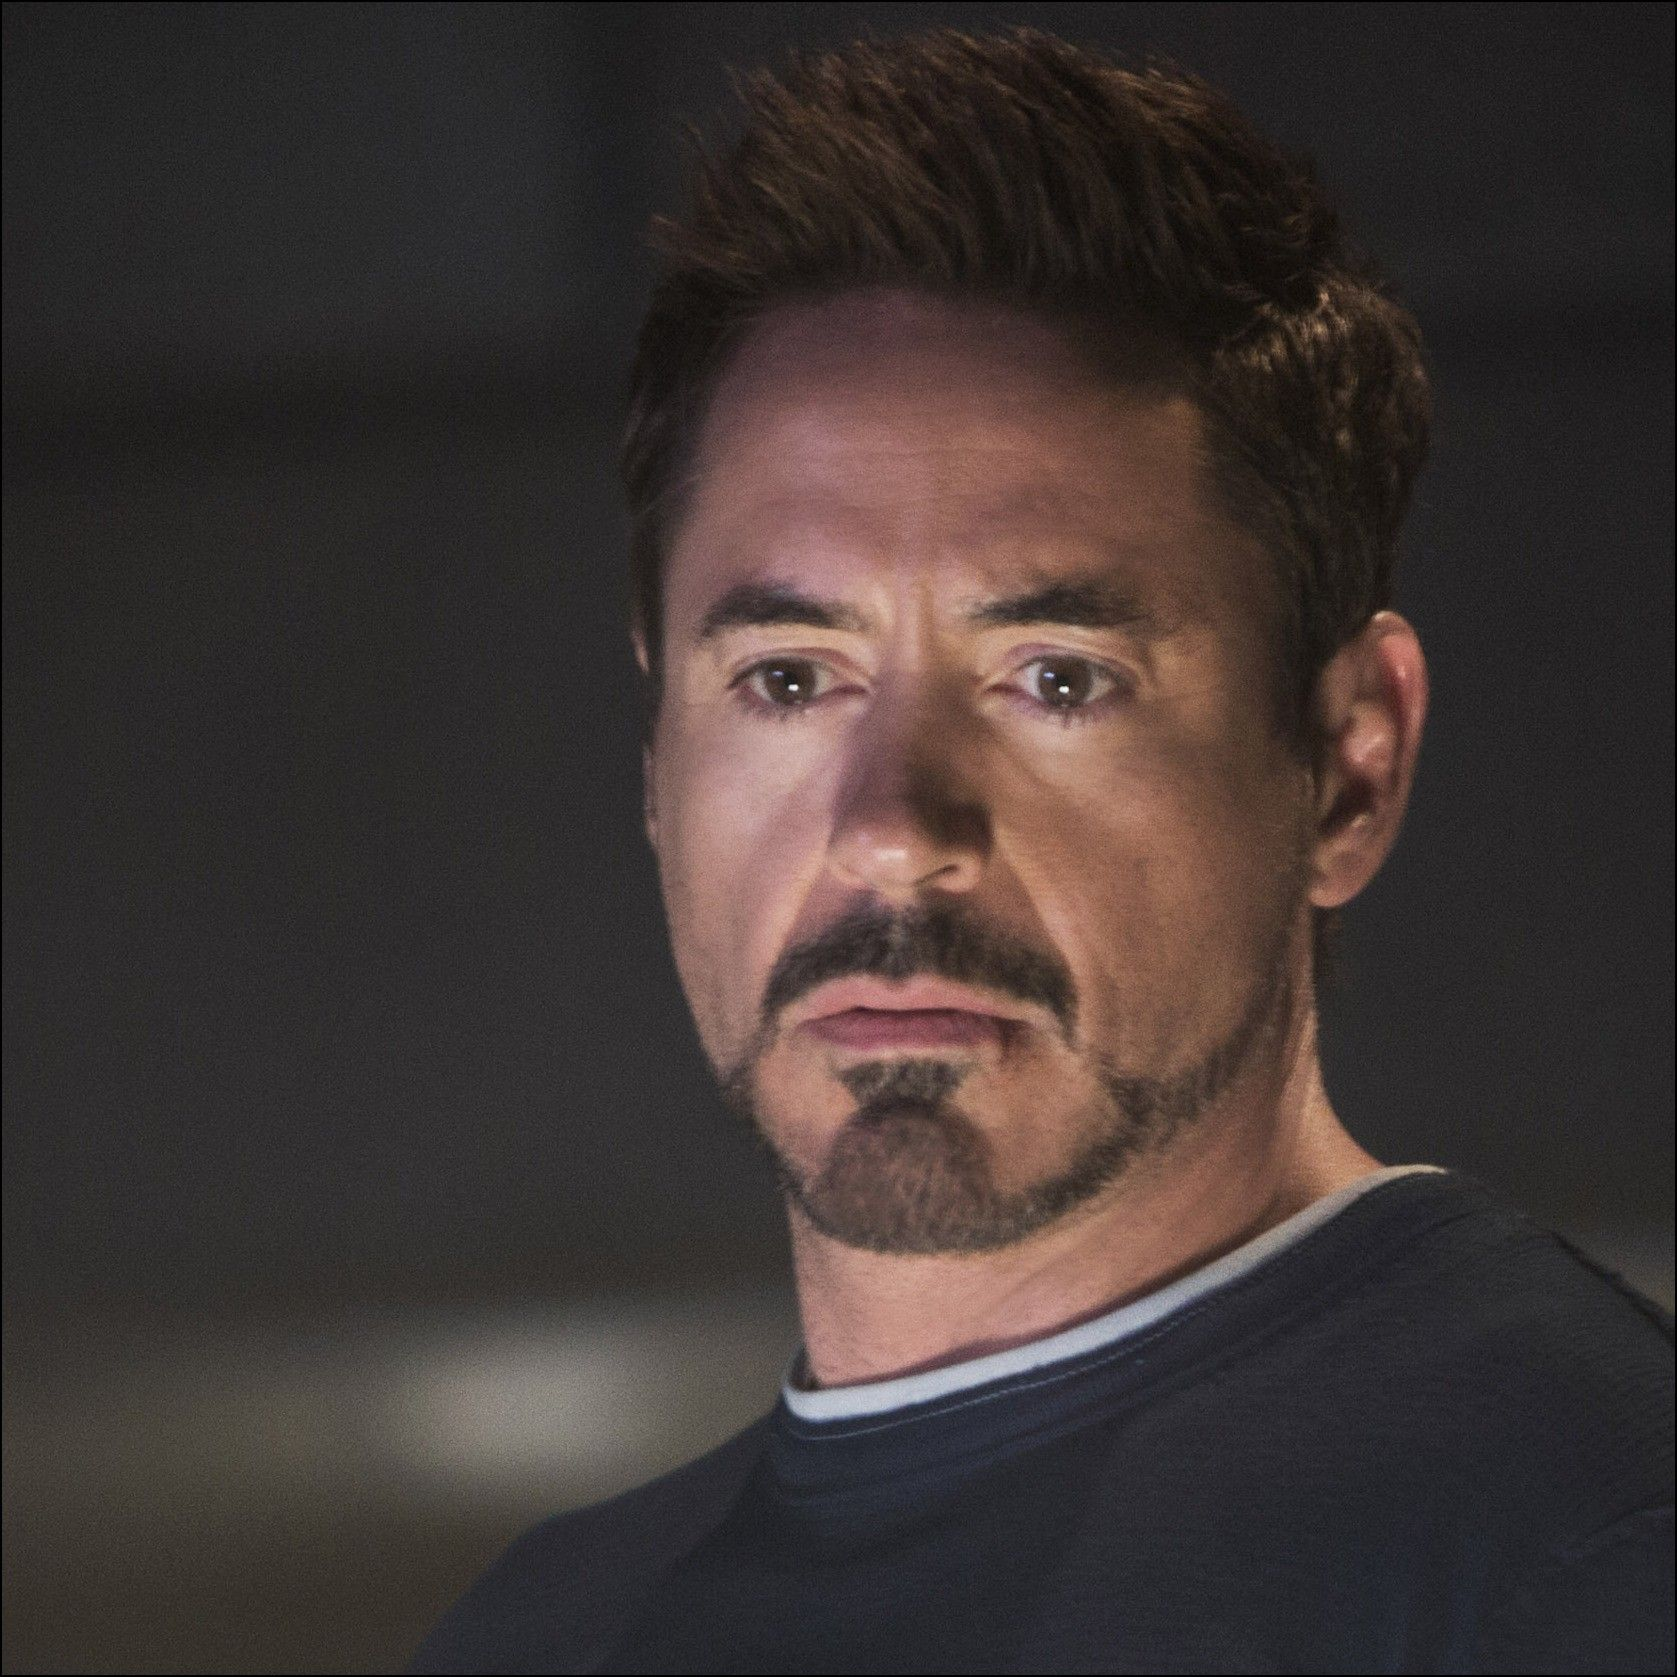 Iron Man Haircut Robert Downey Jr Iron Man Tony Stark Robert Downey Jnr